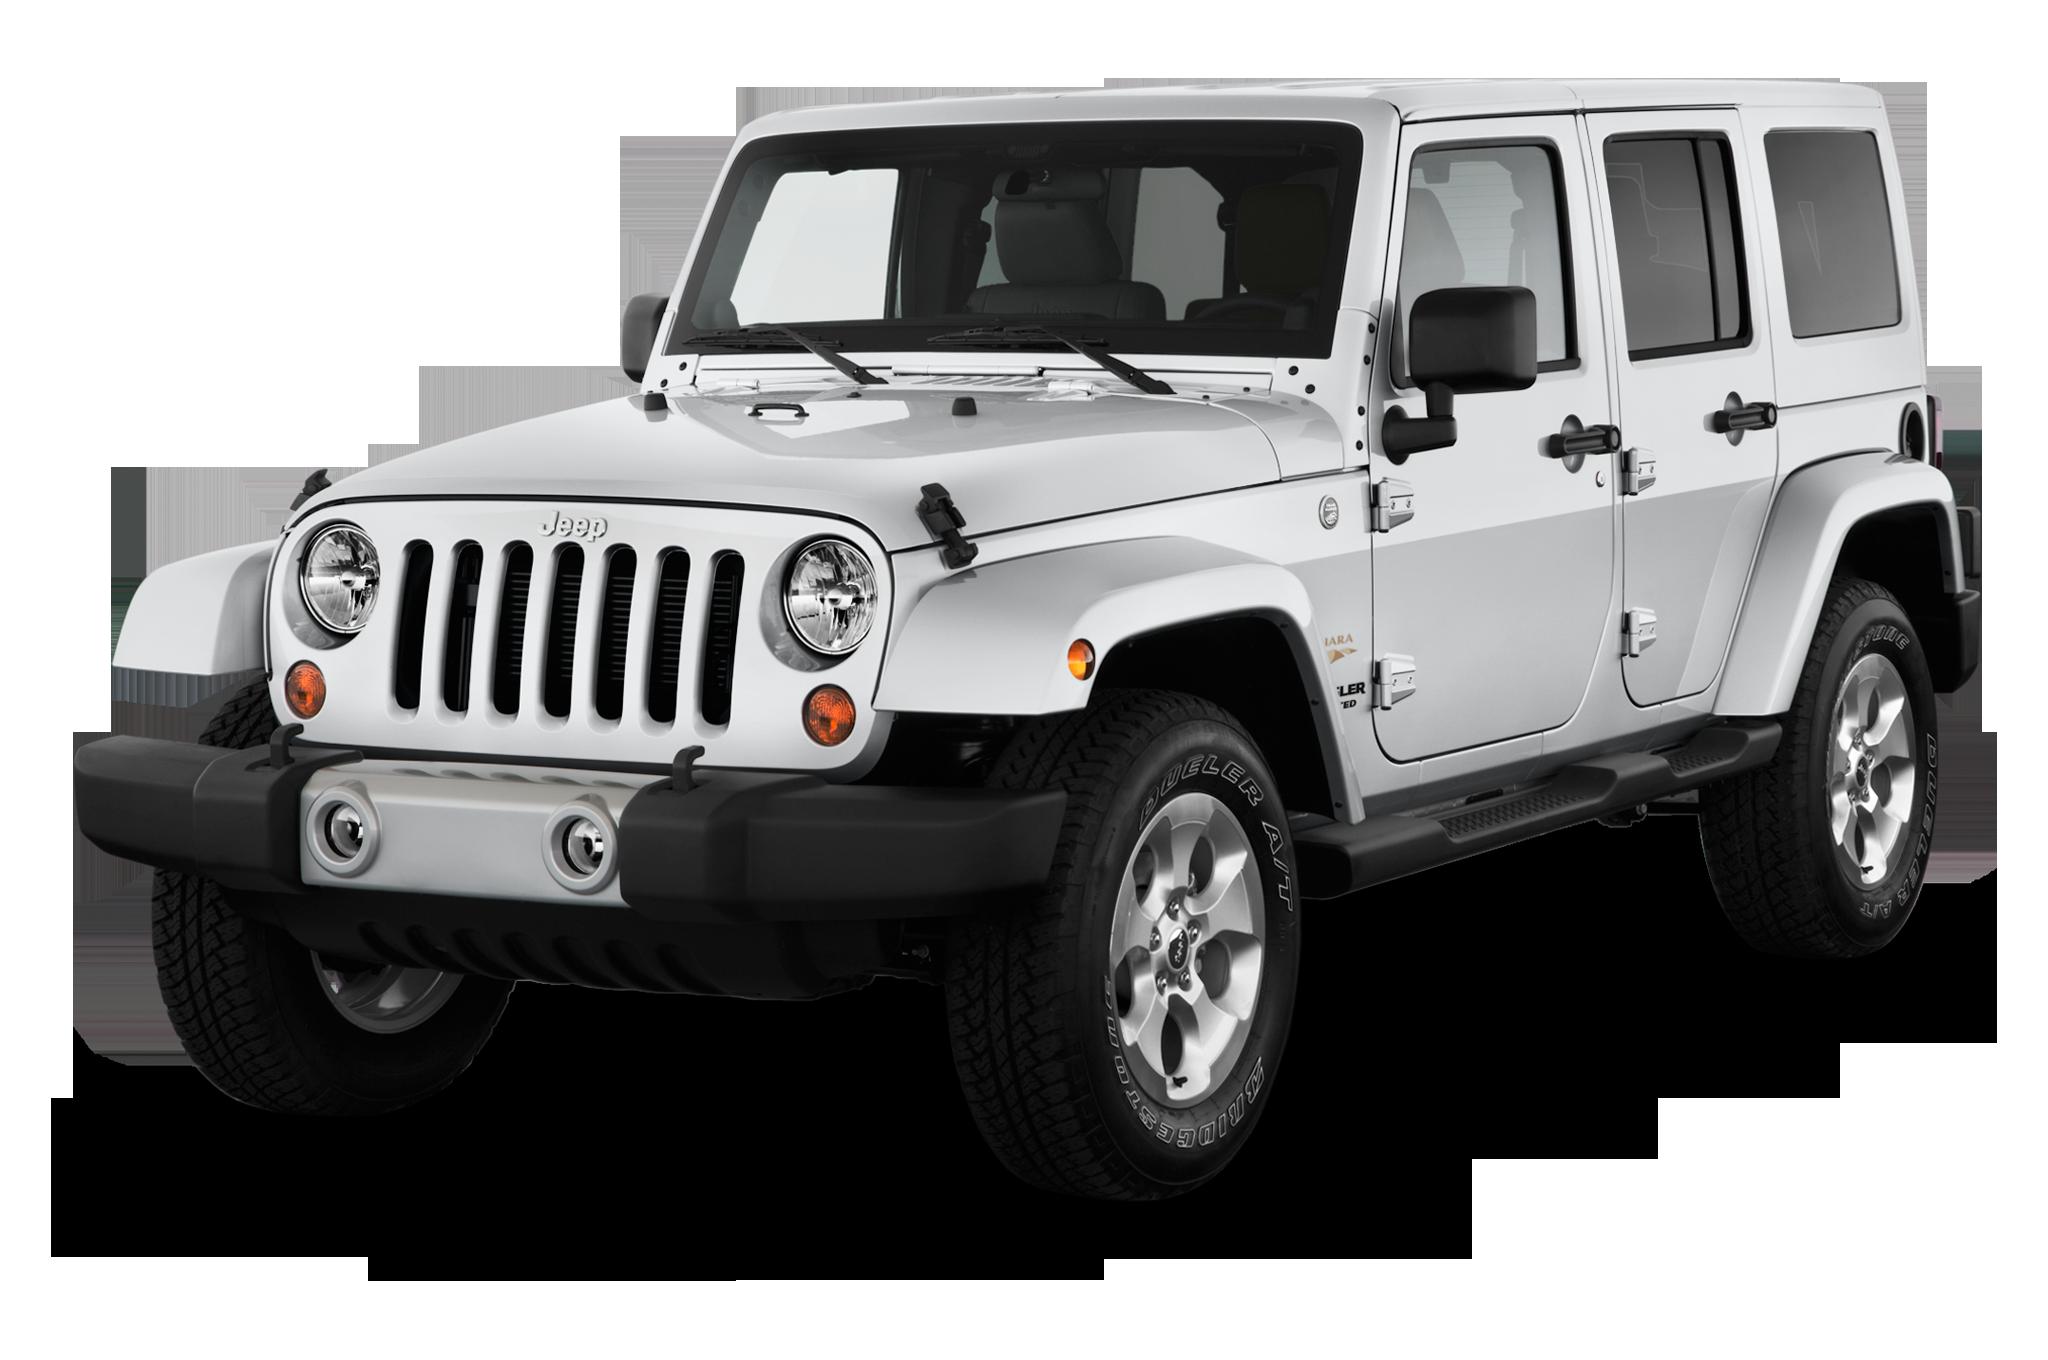 front news michigan door sahara jeep doors unlimited shots wrangler in automobile magazine spy angular spied